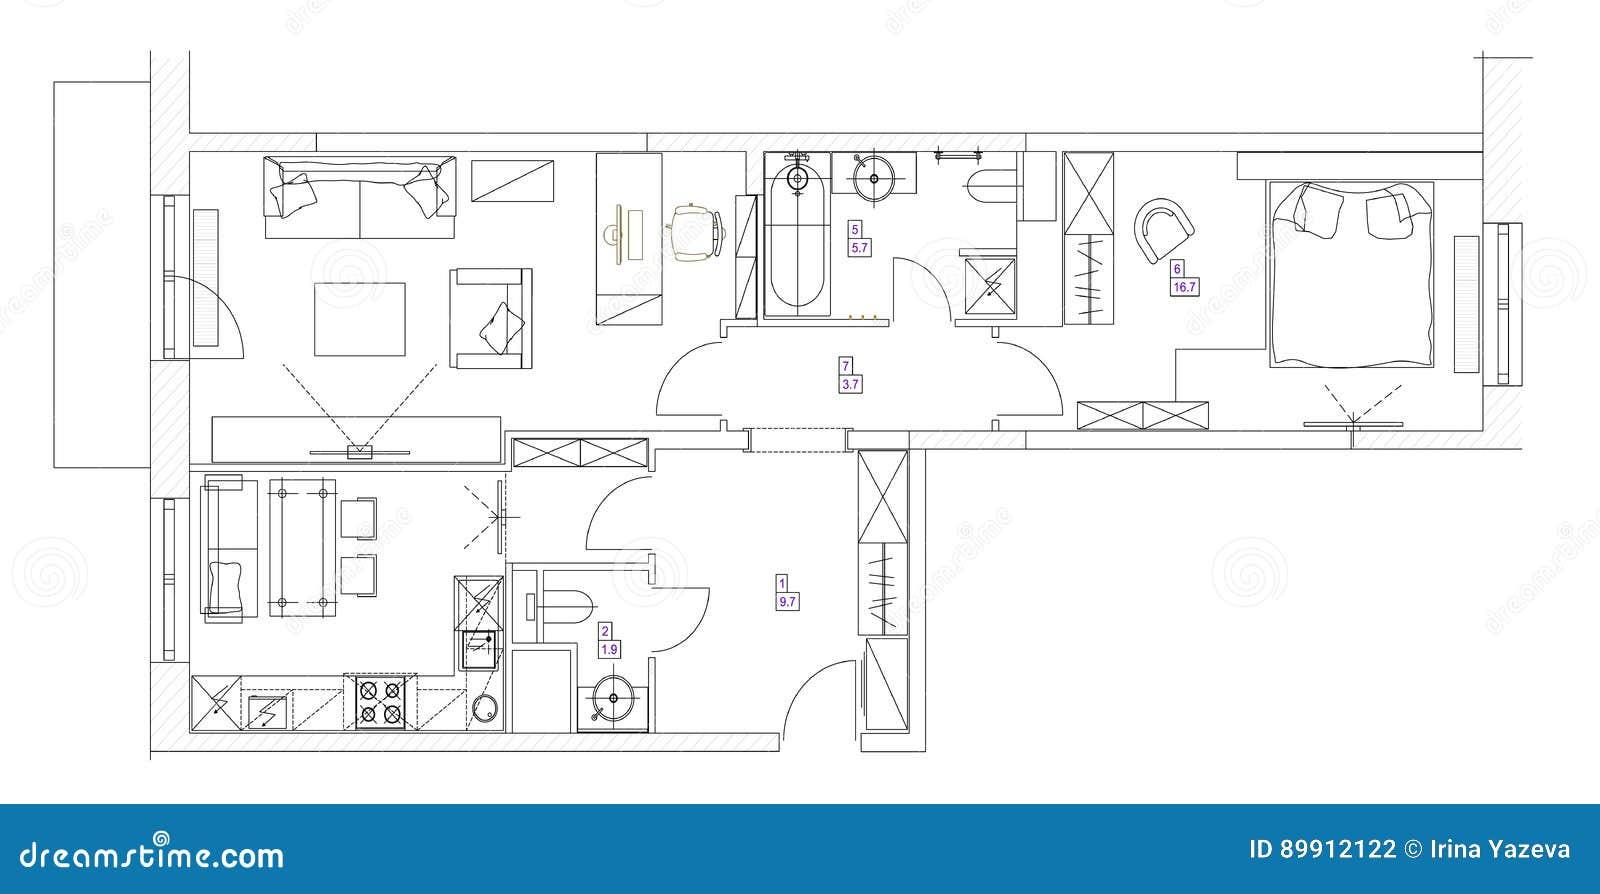 Architectural Drawing Set architectural furniture symbols drawings,furniture.printable